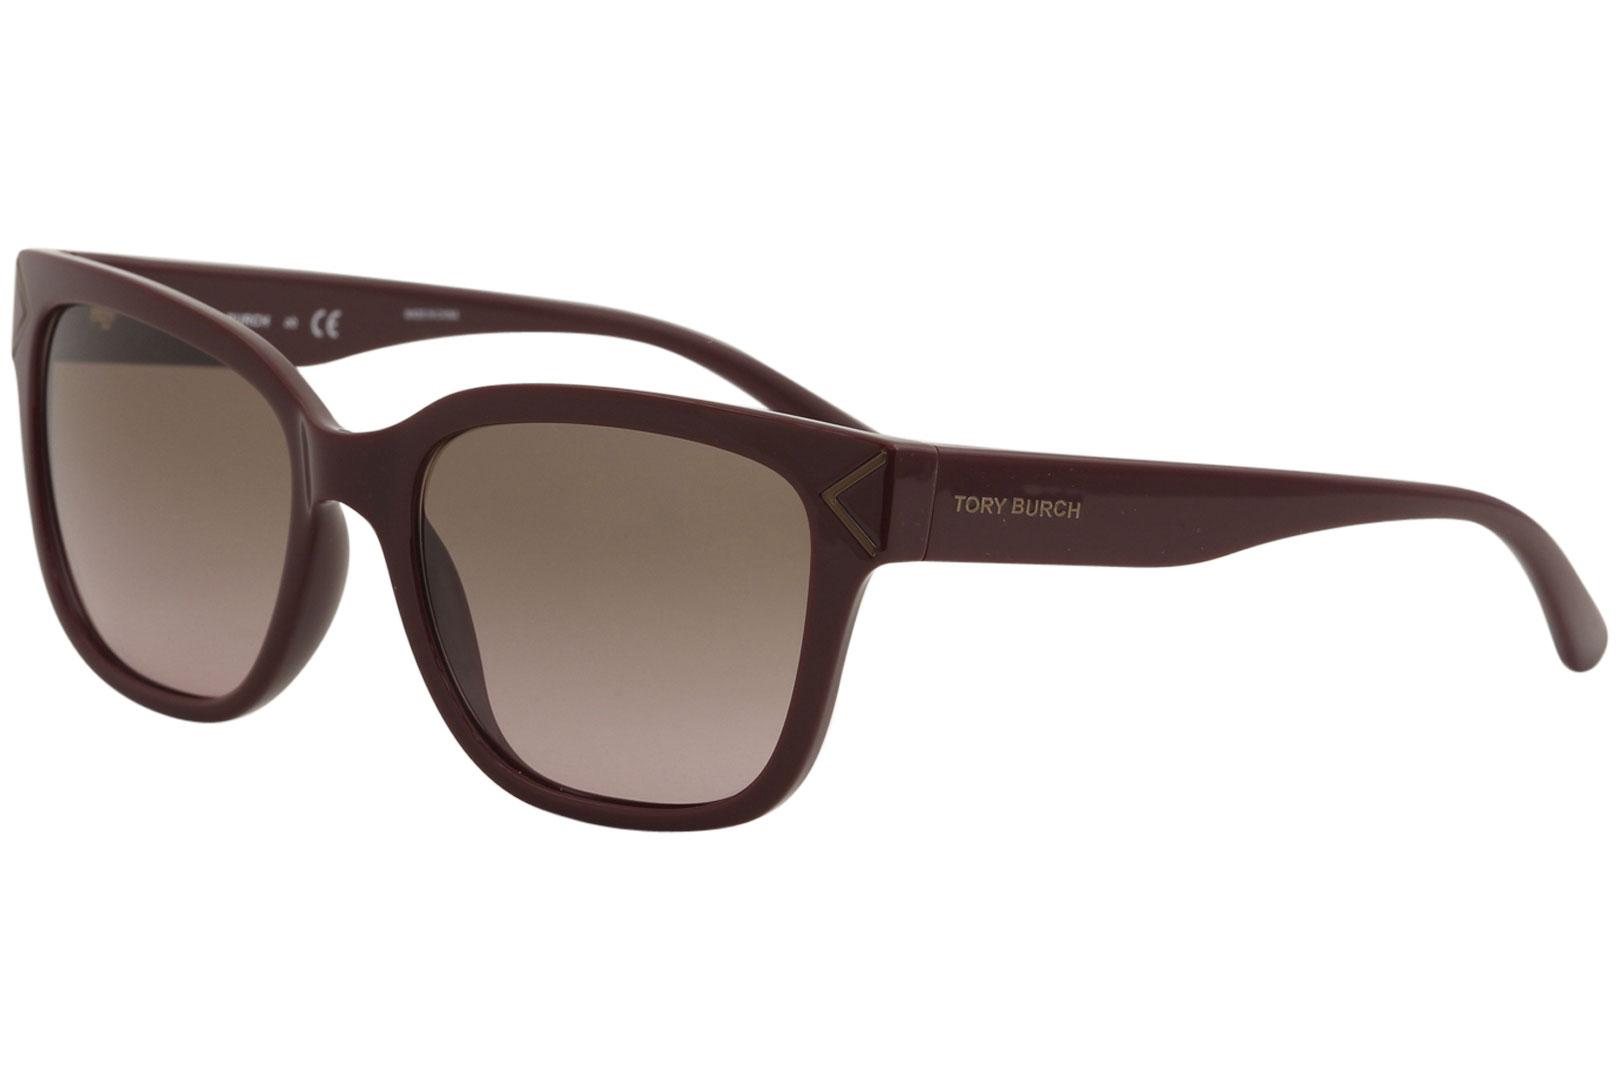 8742b53446b7 Tory Burch Women's TY9050 TY/9050 1681/14 Bordeaux Square Sunglasses ...